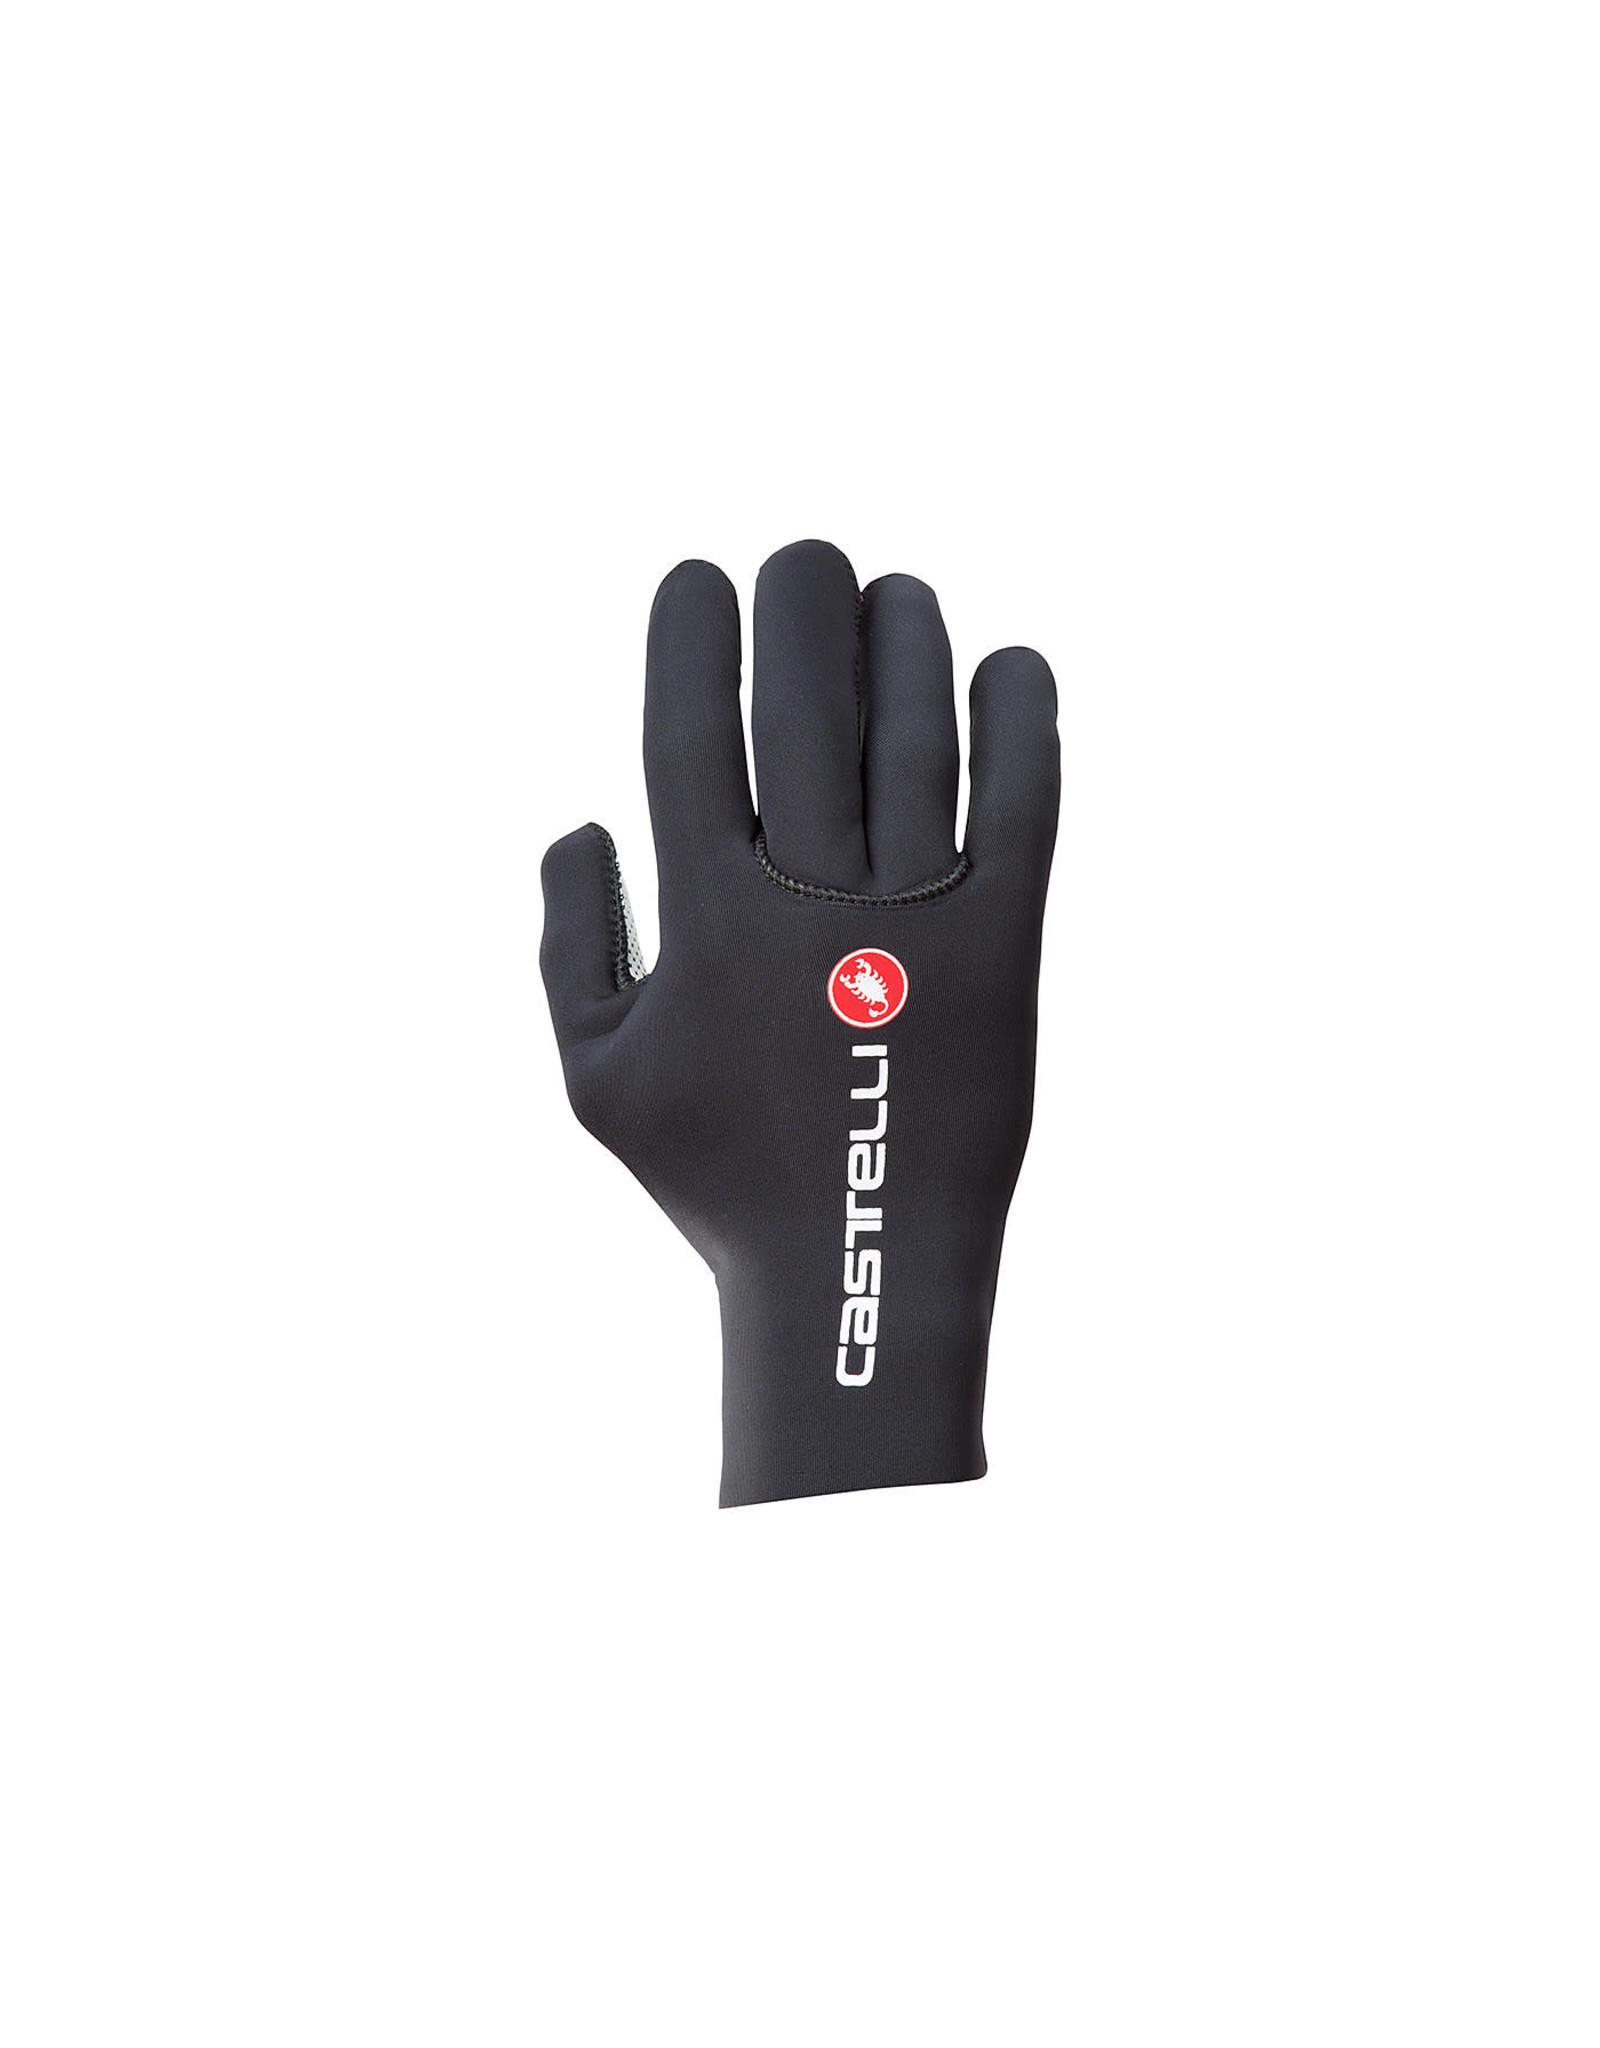 Castelli '20, CASTELLI, Diluvio C Glove